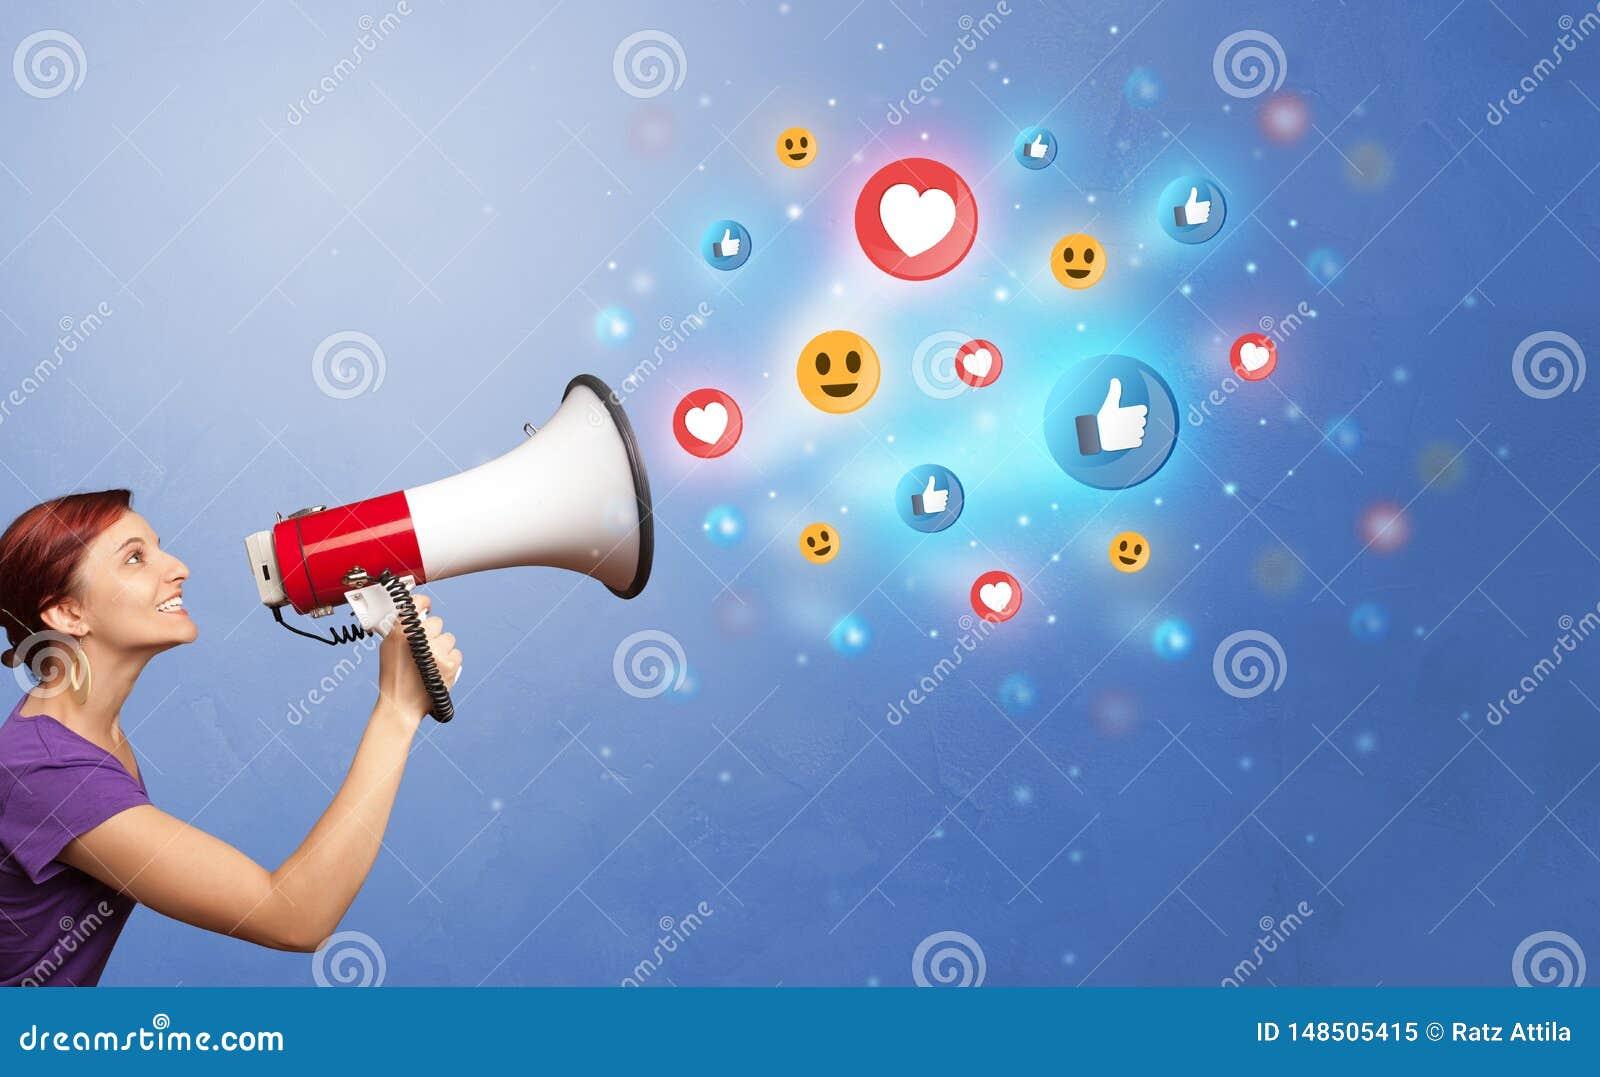 Person speaking in loudspeaker with social media concept